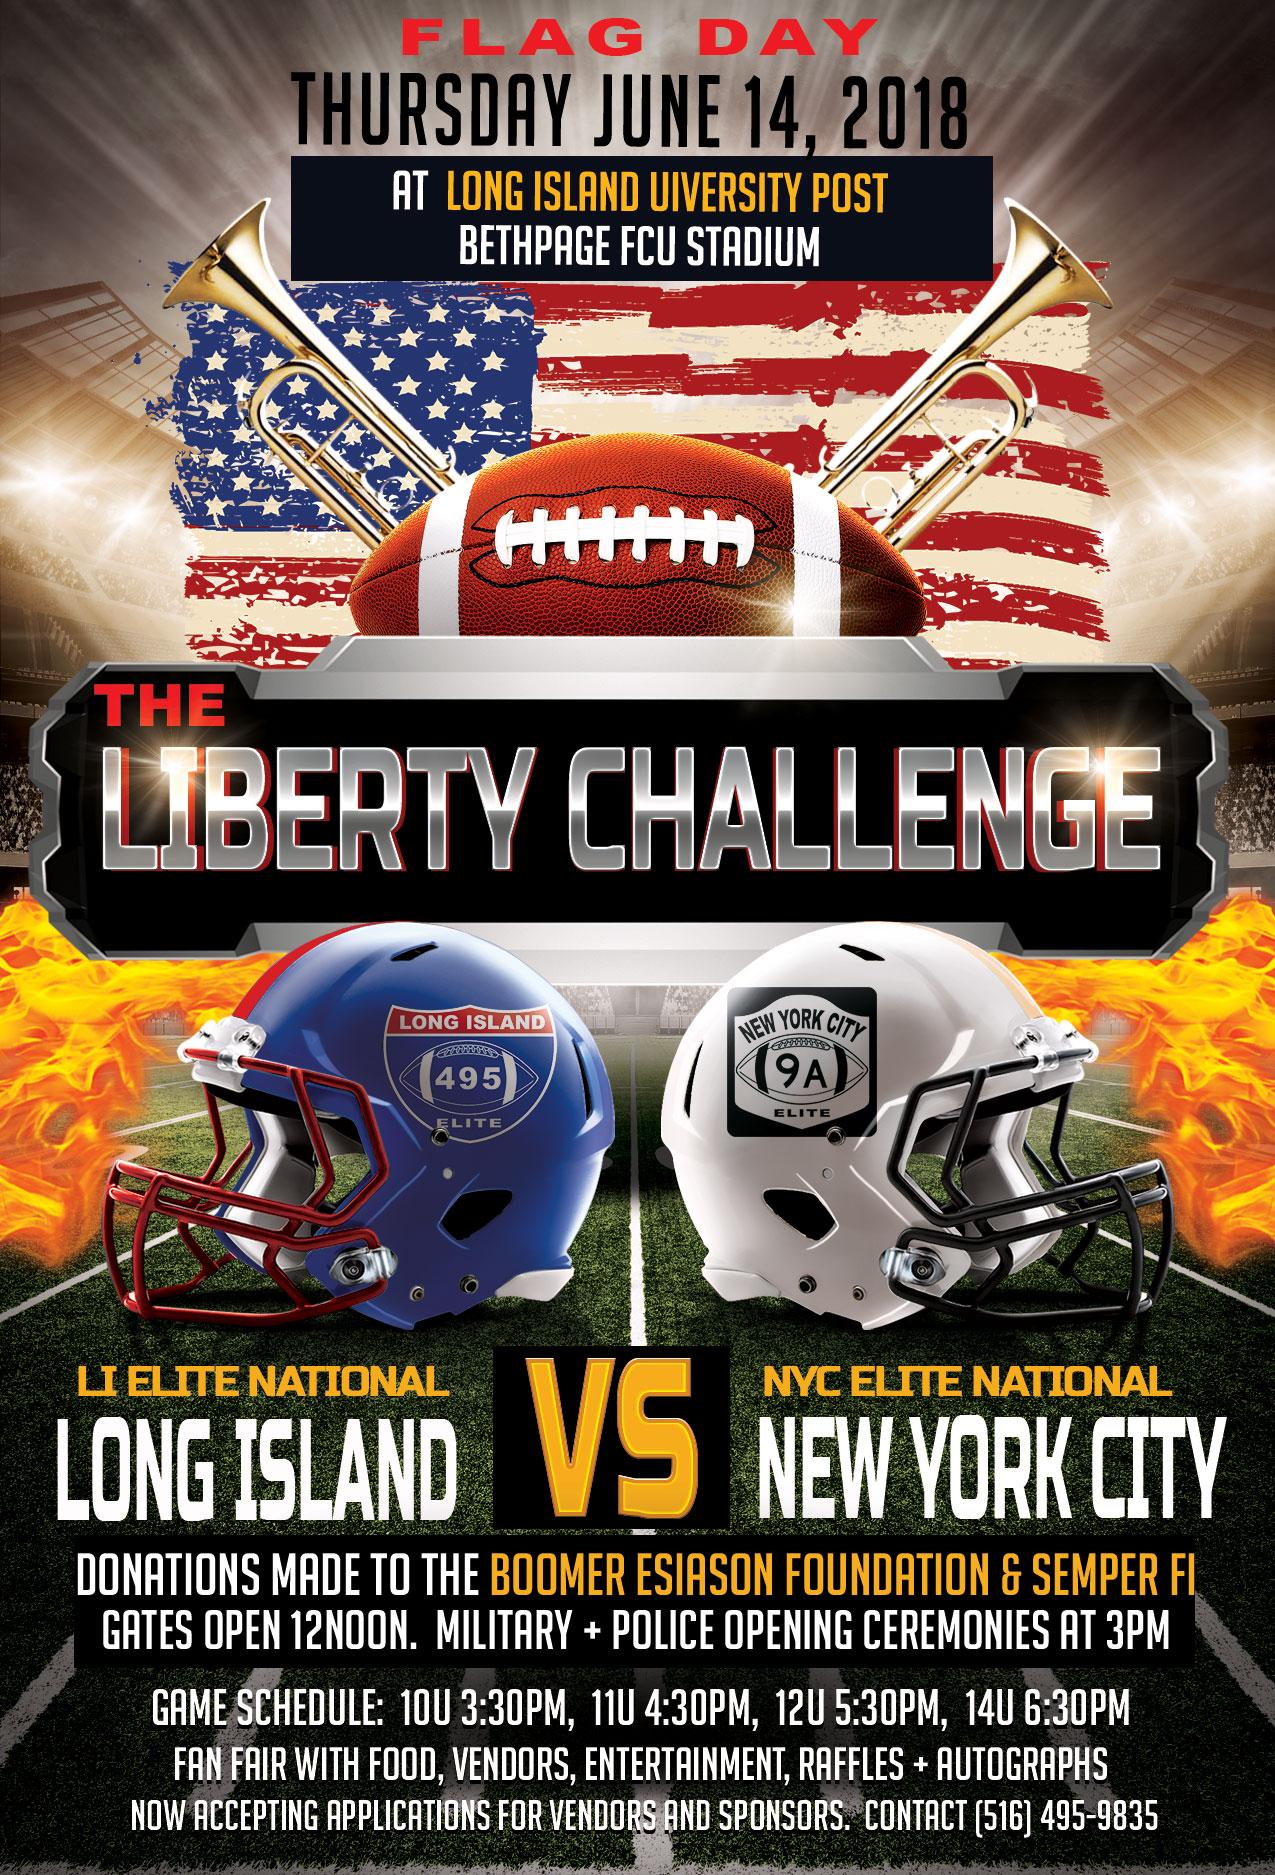 Long Island New York City Football Game